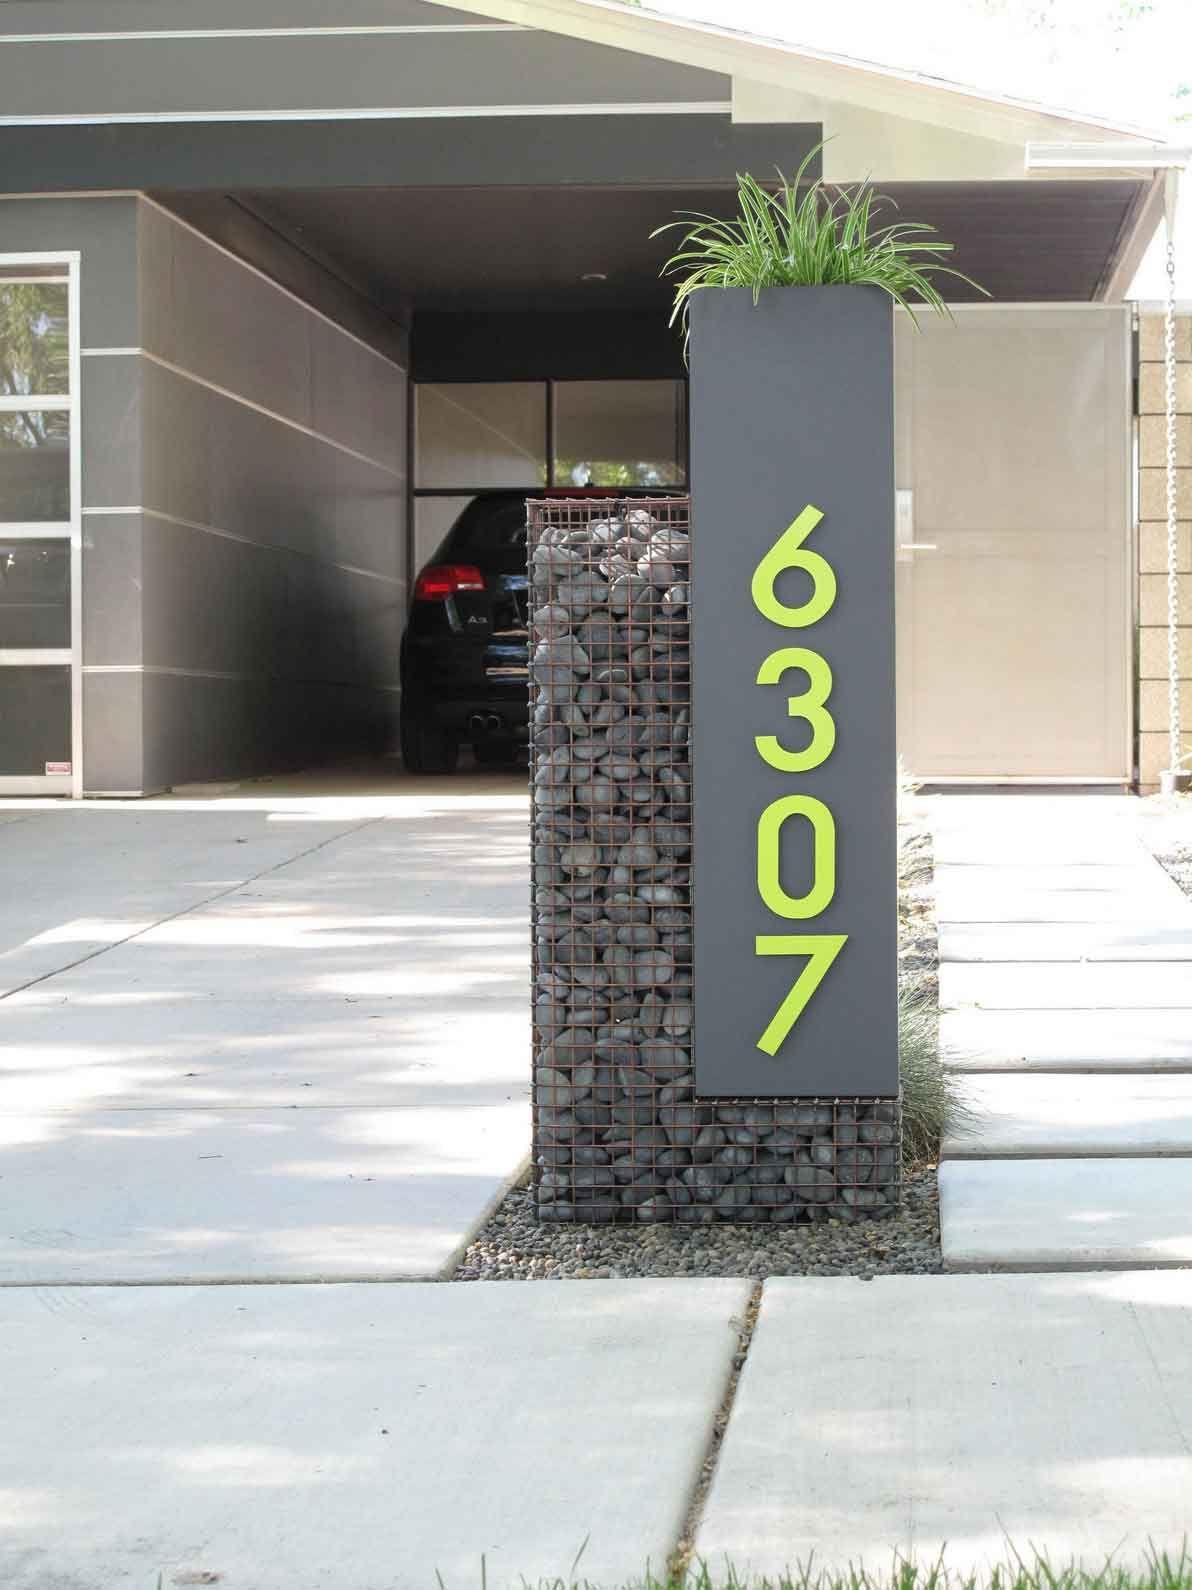 Unique Address Number Decoration garden/jardim/horta